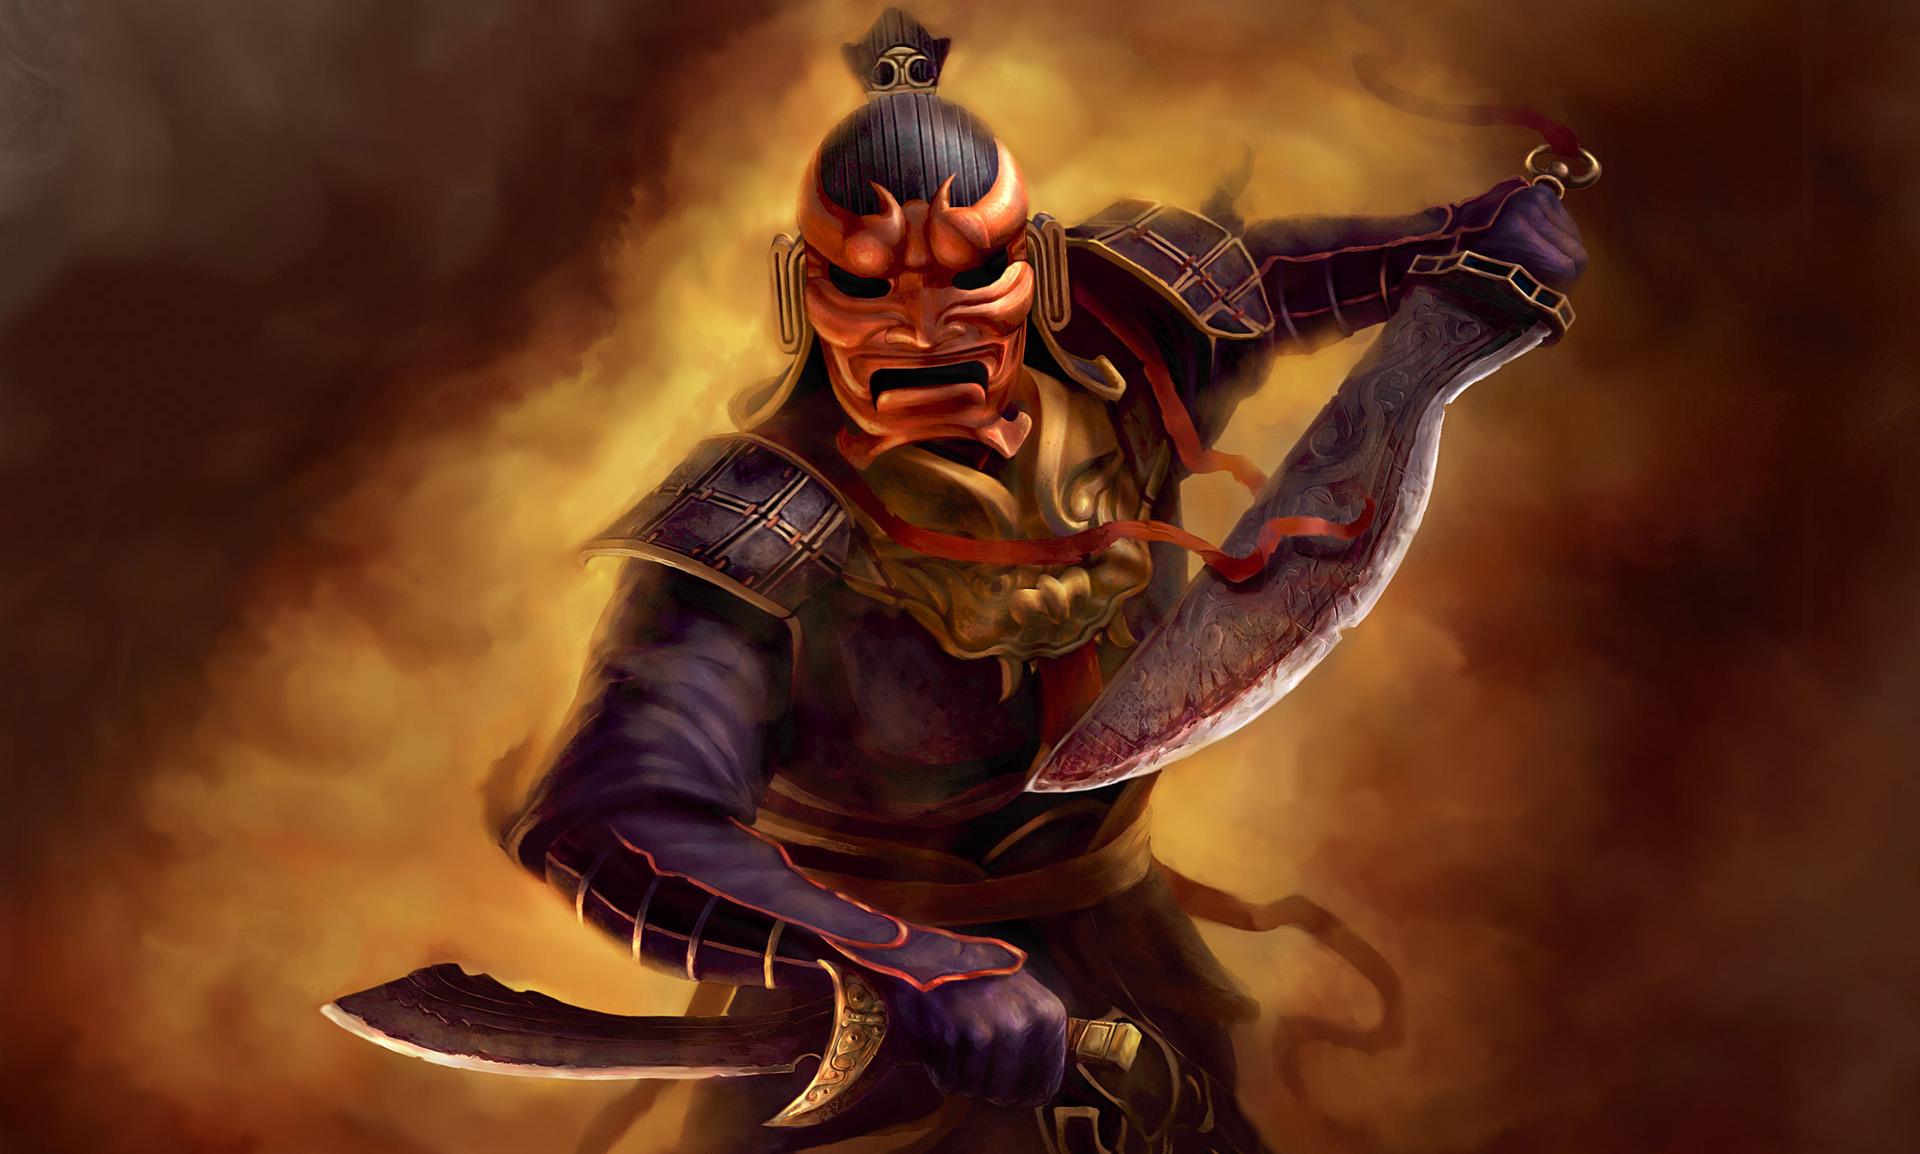 Trilogie Crysis, Jade Empire a dalších 6 her pro předplatitele Origin Access 127008